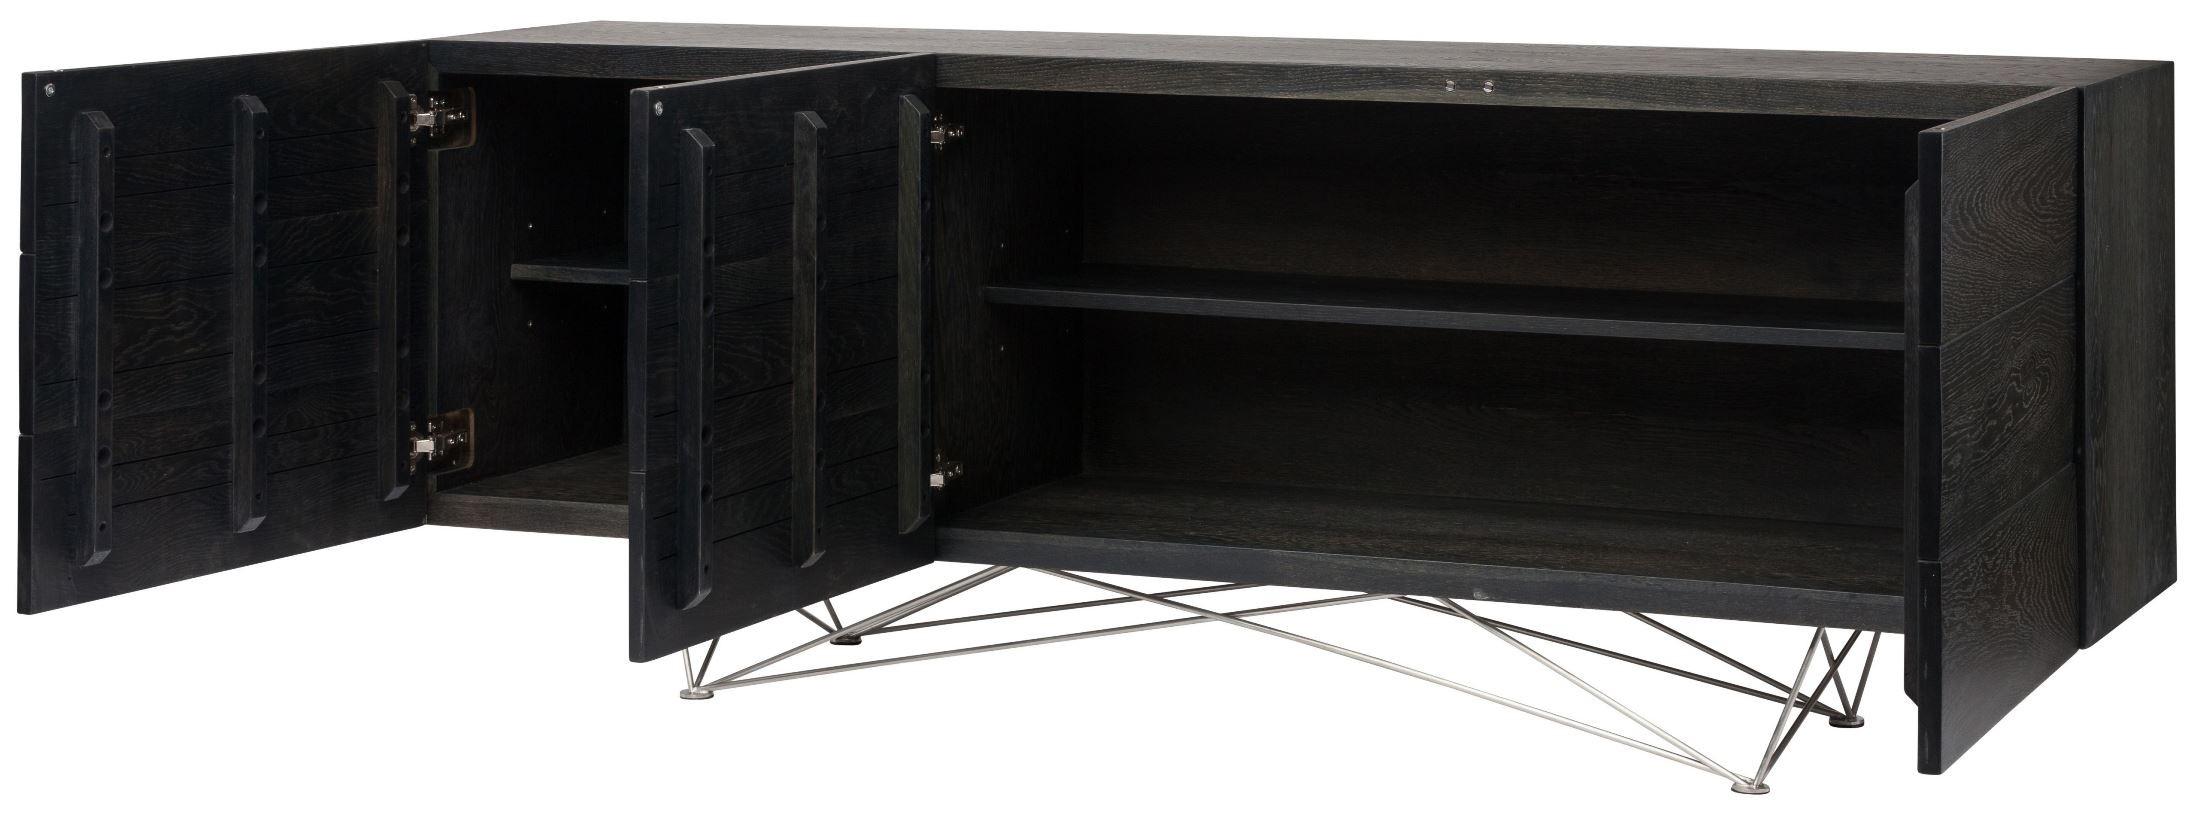 Zola Ebonized Wood Sideboard Cabinet, HGSR464, Nuevo